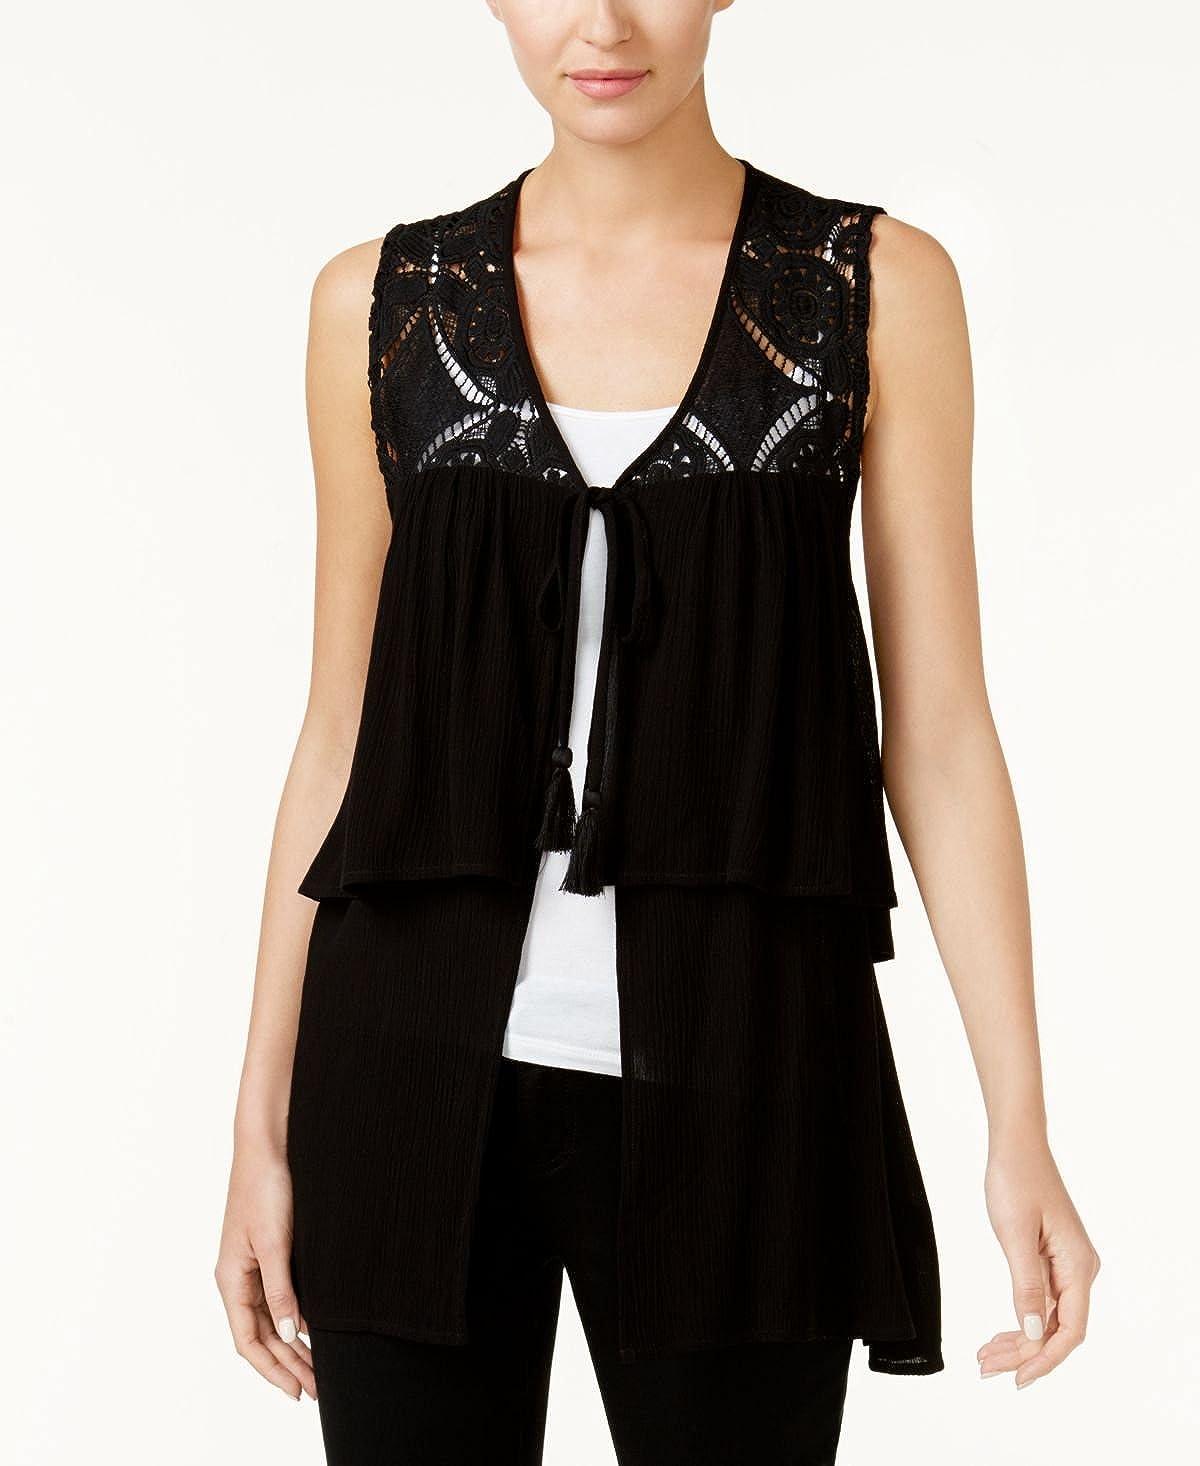 August Silk Company Tiered Crochet-Contrast Vest in Black